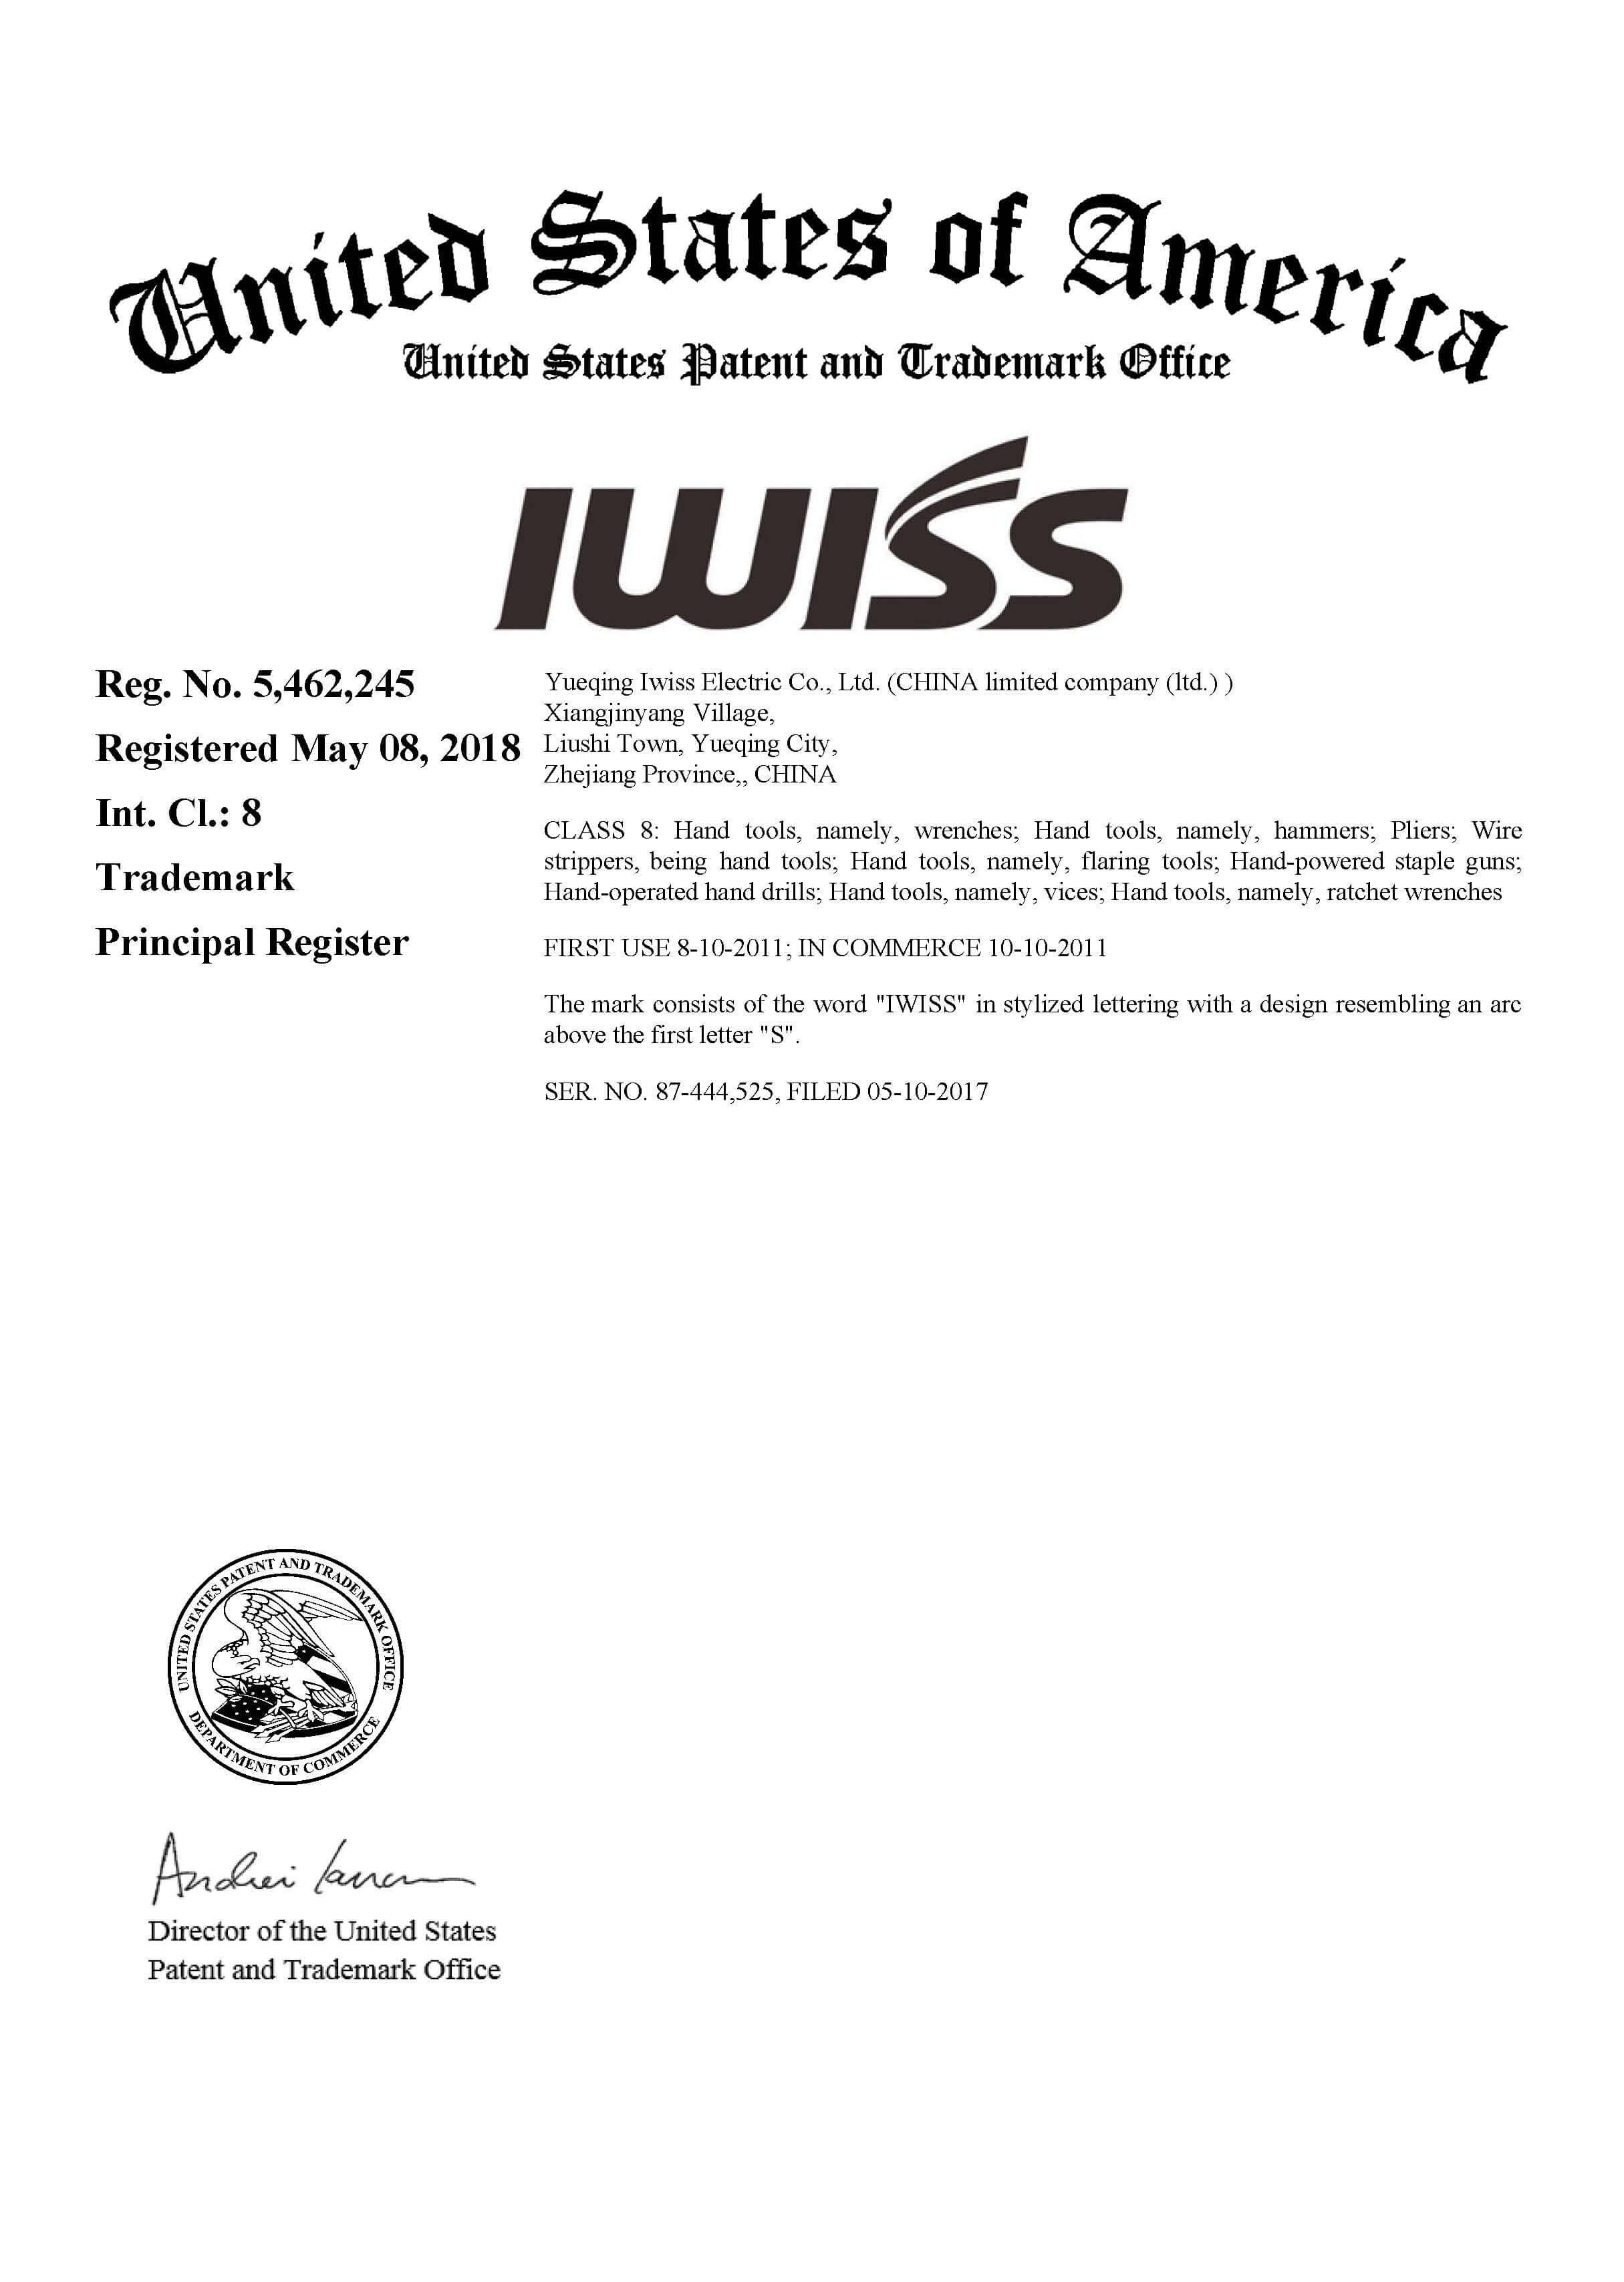 Archivo de certificación IWISS USA int.cl 8